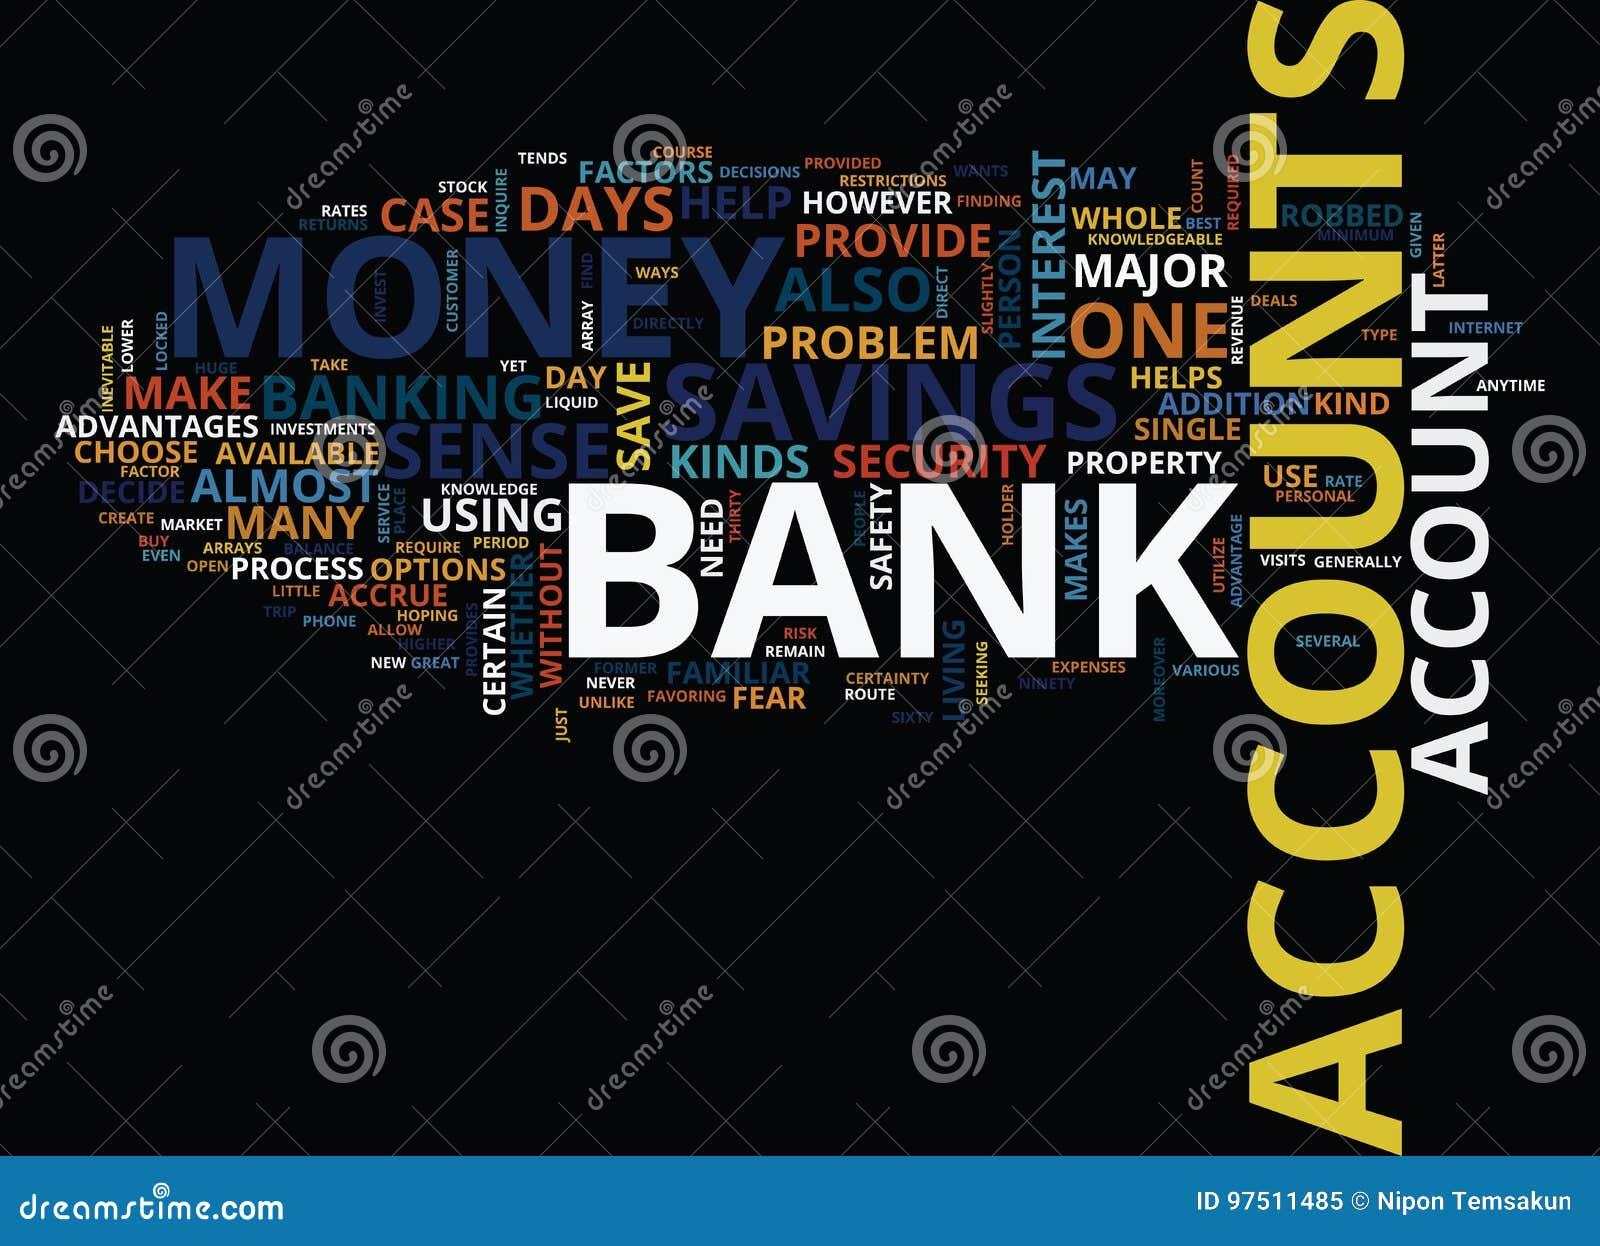 Arrays Of Bank Accounts Word Cloud Concept